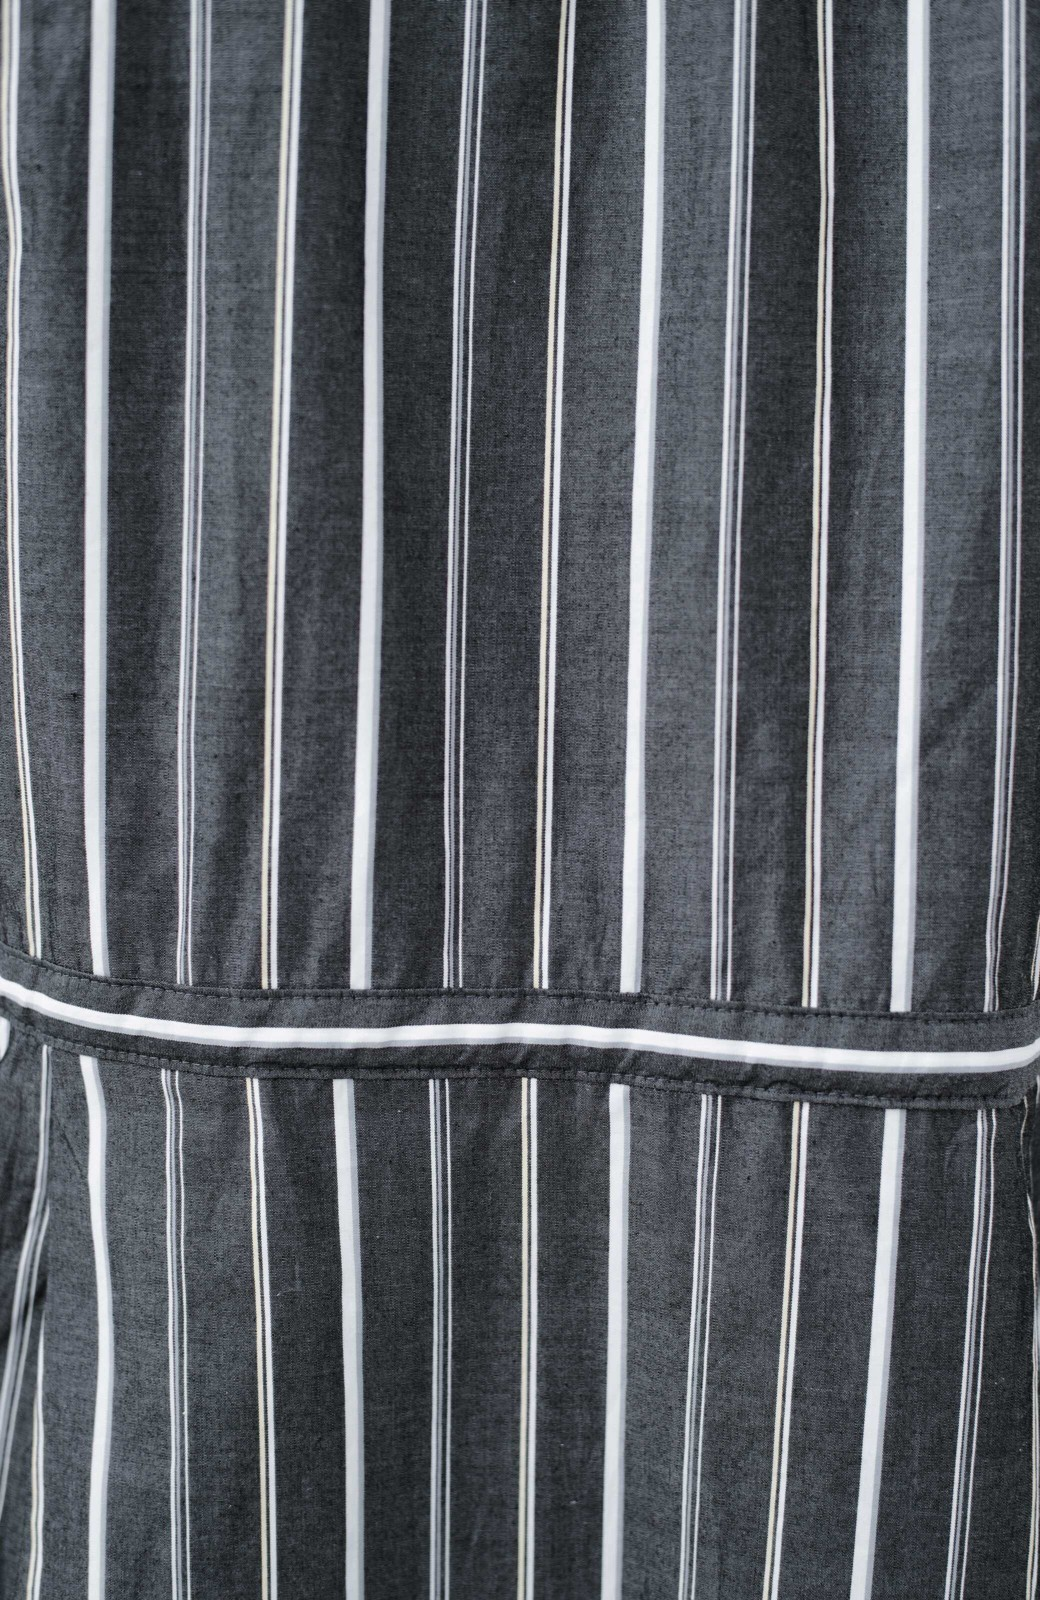 haco! パッと着て、今っぽかわいくなれる ウエストリボンがポイントのマルチストライプワンピース <ブラック>の商品写真4